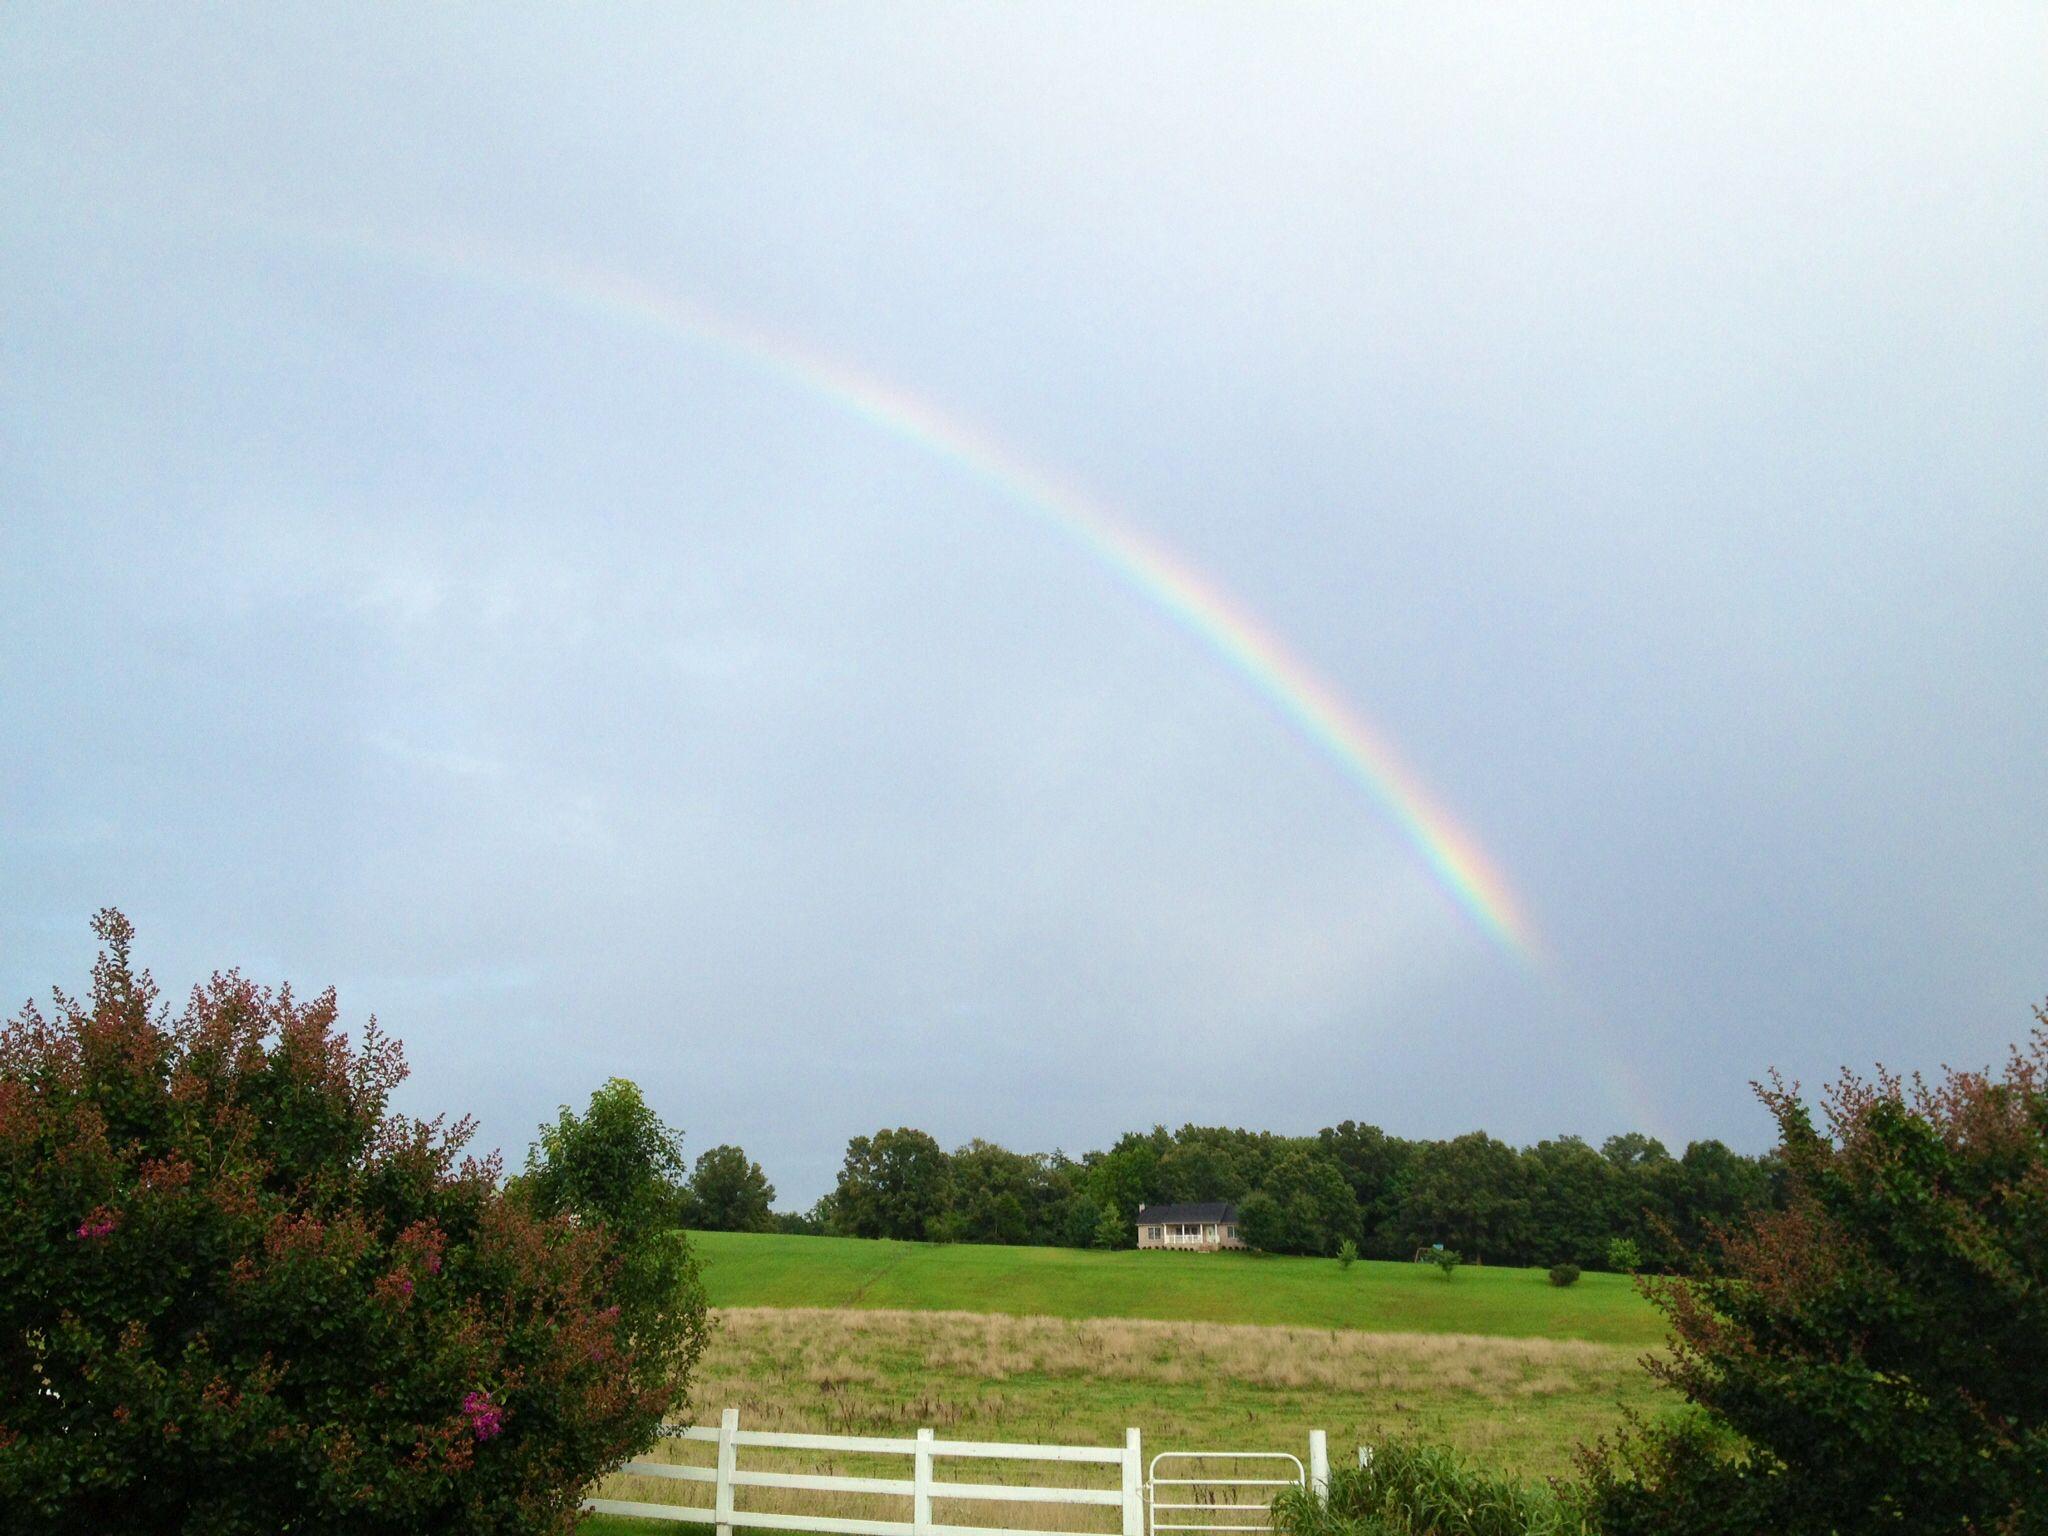 Rainbow awesome!